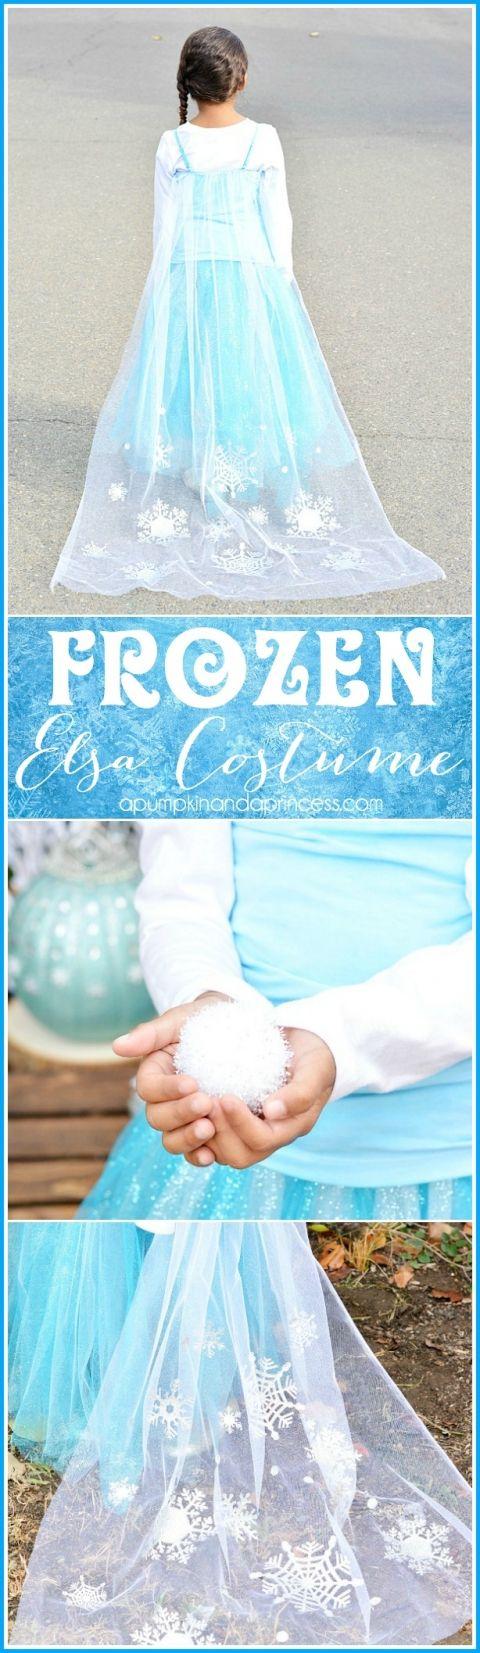 DIY Disney Elsa Costume | Pinterest | Kostüm, Kinder party und Diy ...